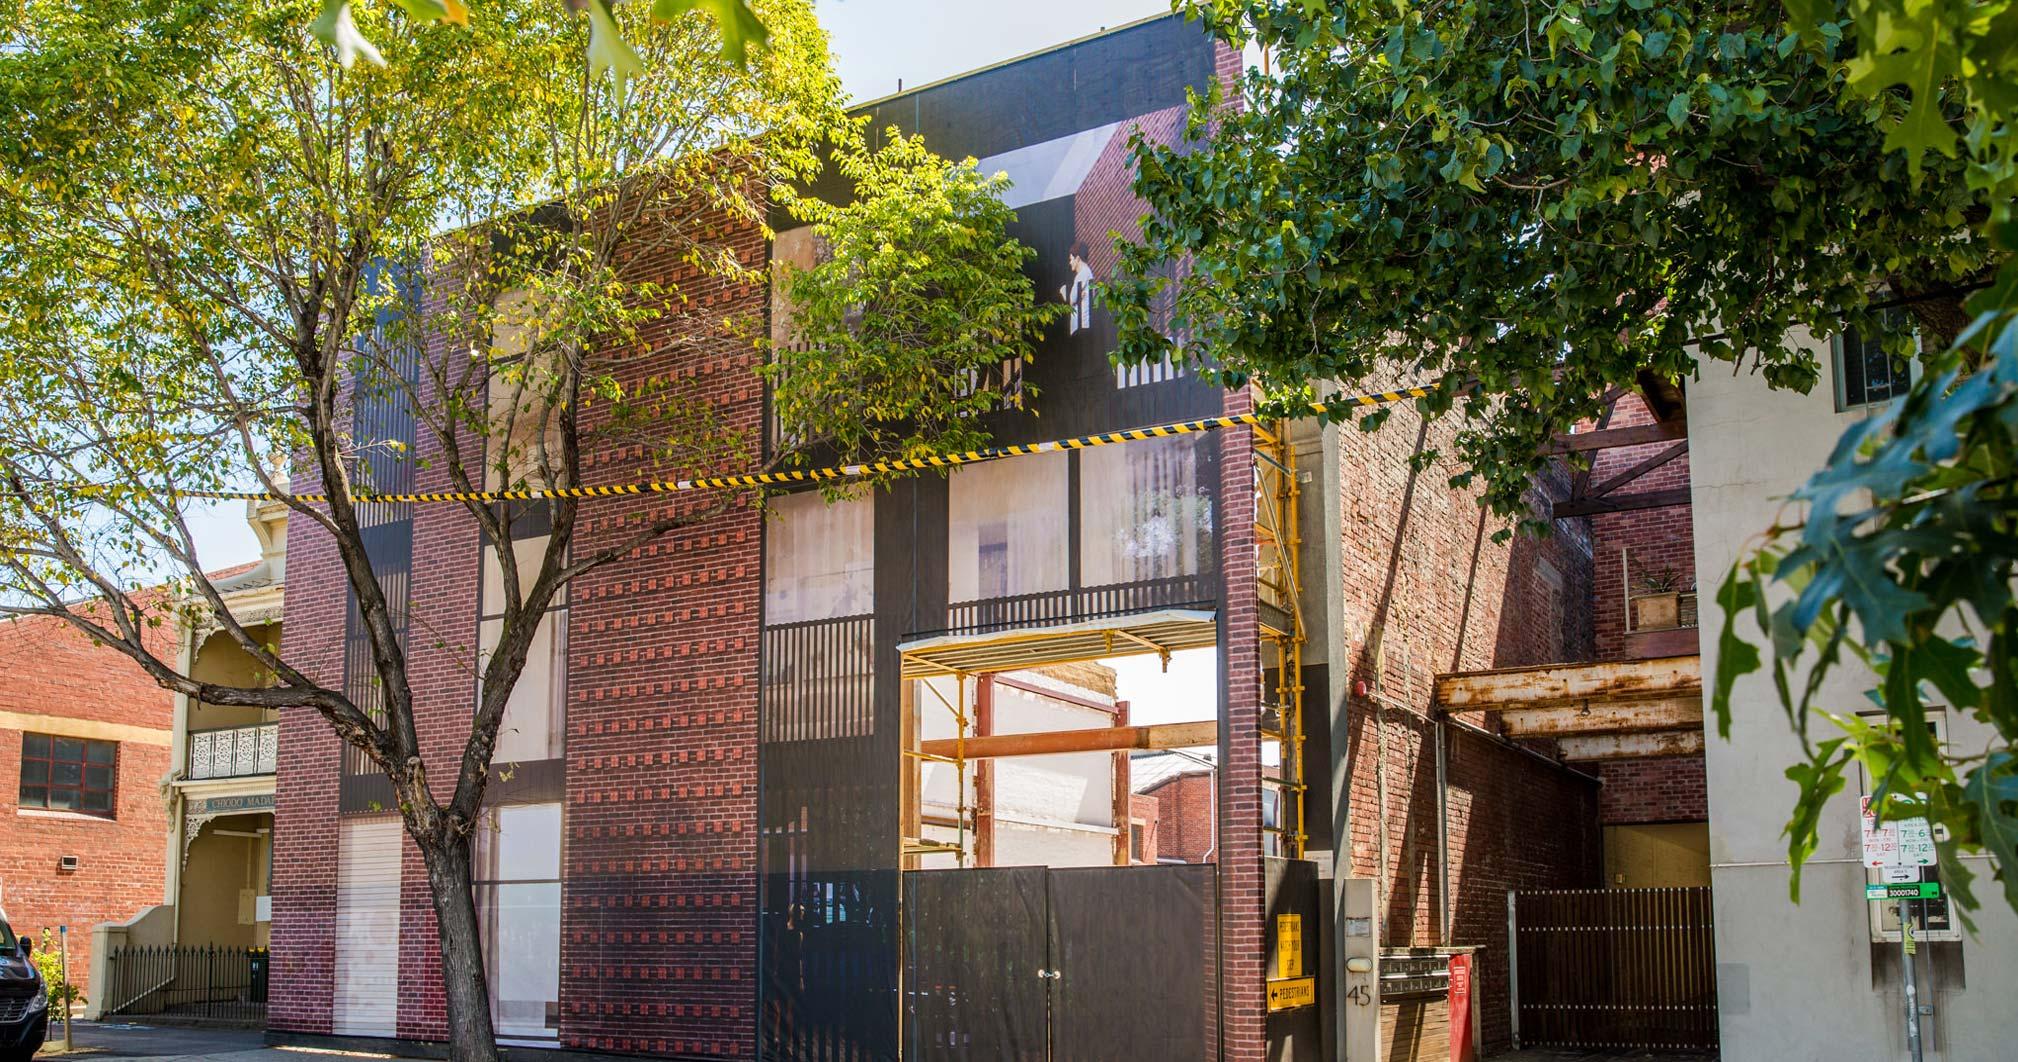 Leveson Place Facade - Under Construction